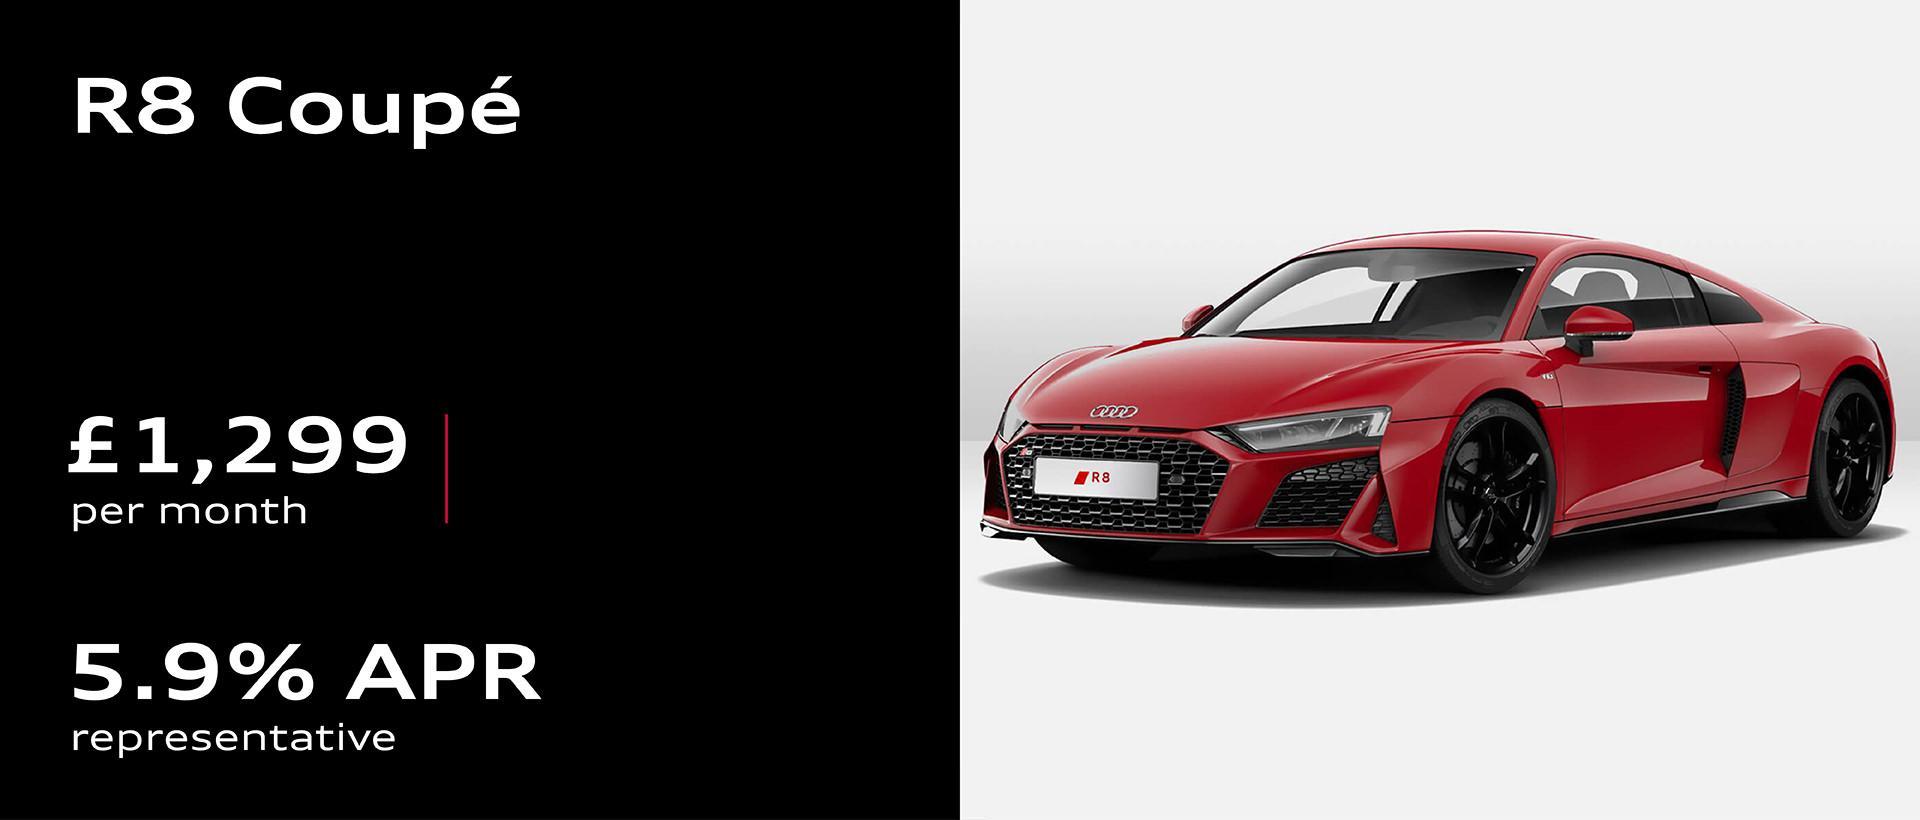 Audi R8 Coupé Finance Offer